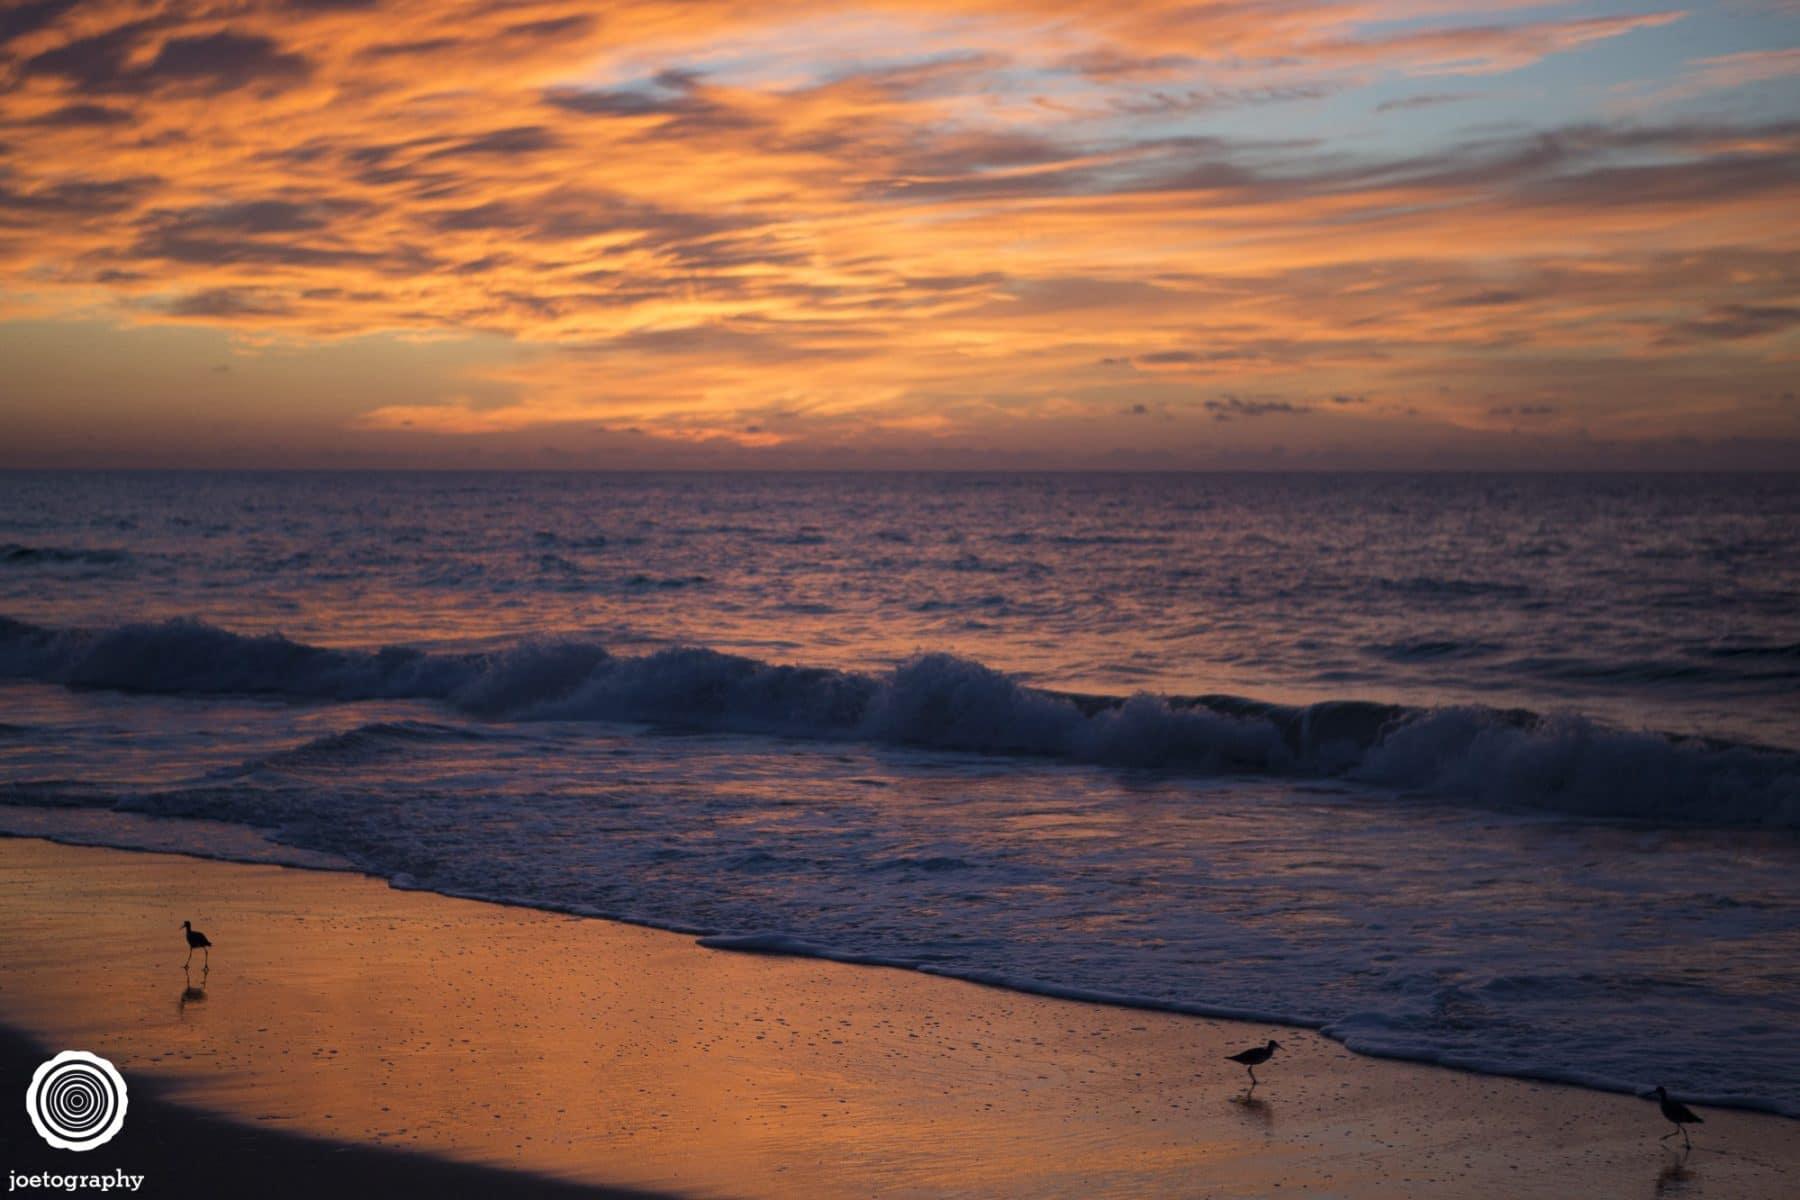 Outer-Banks-North-Carolina-Travel-Photography-16